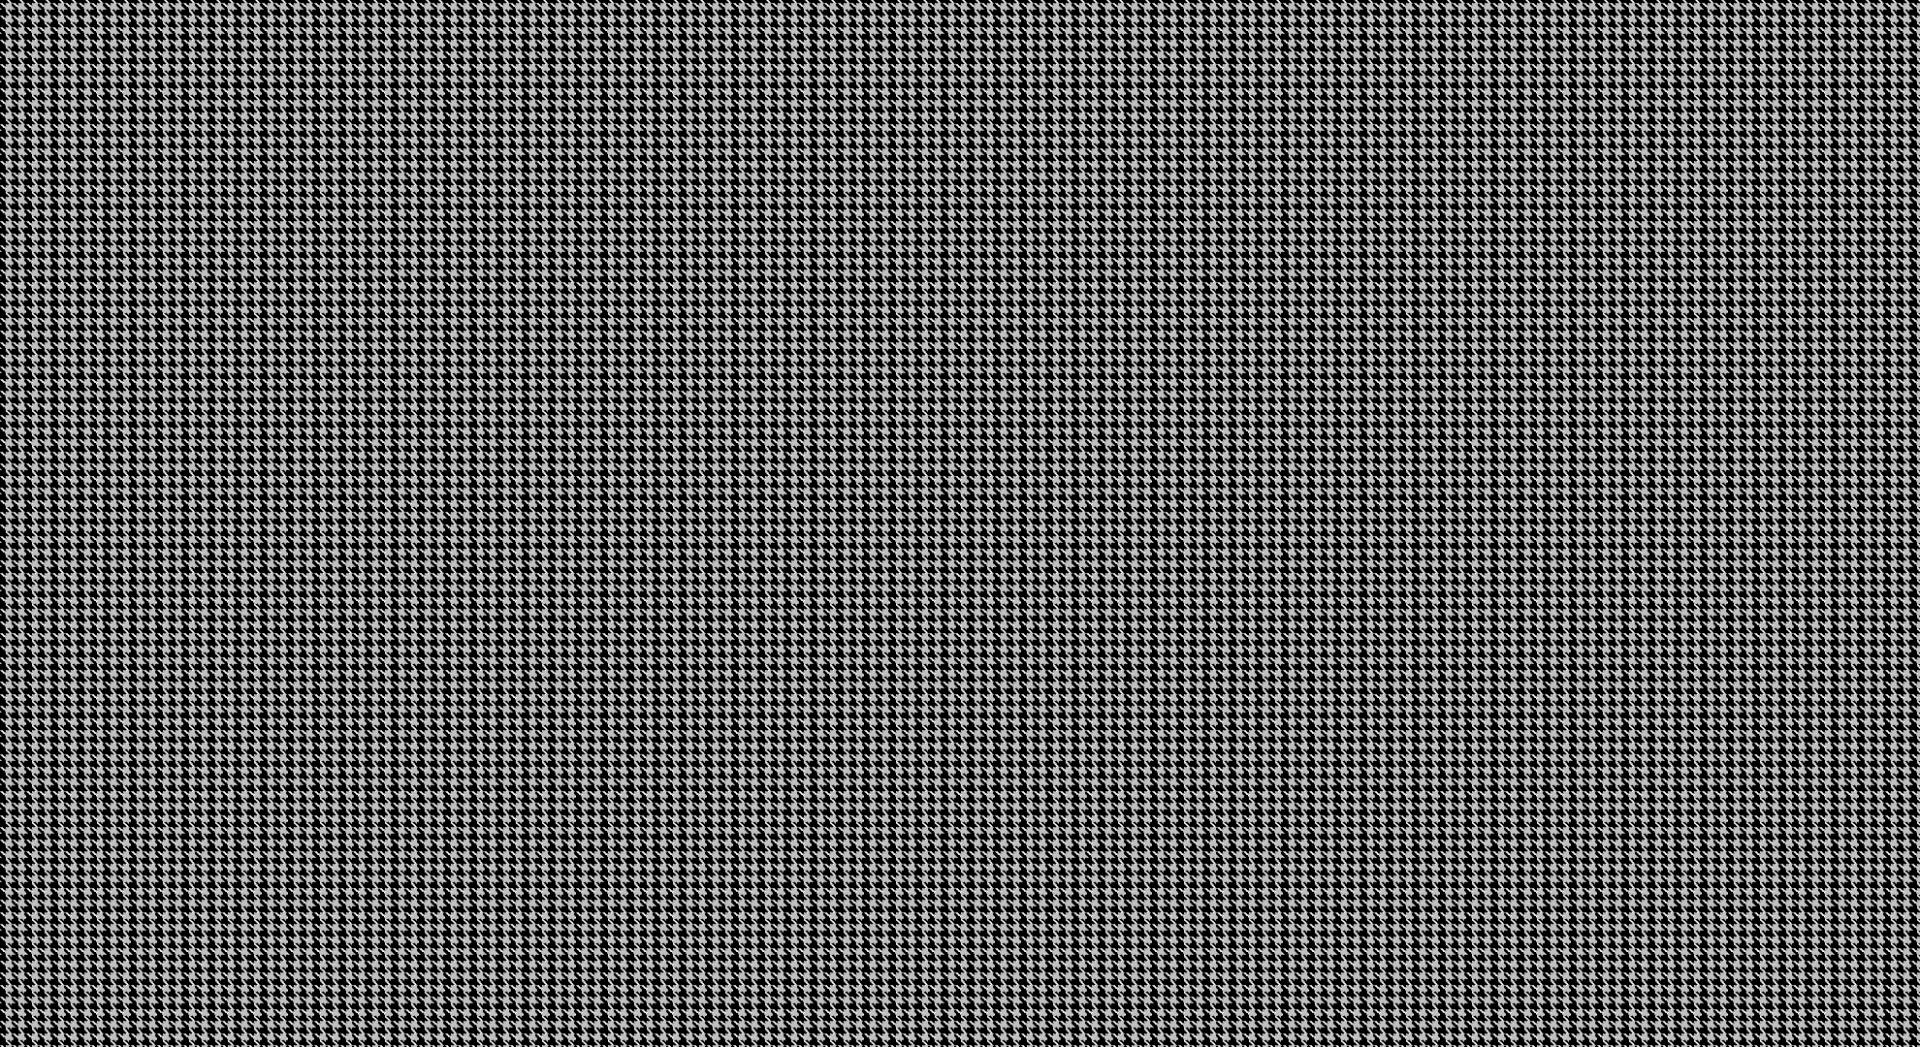 Black Vinyl Windows >> Windows 95 Full HD Wallpaper and Background Image | 1980x1080 | ID:497192